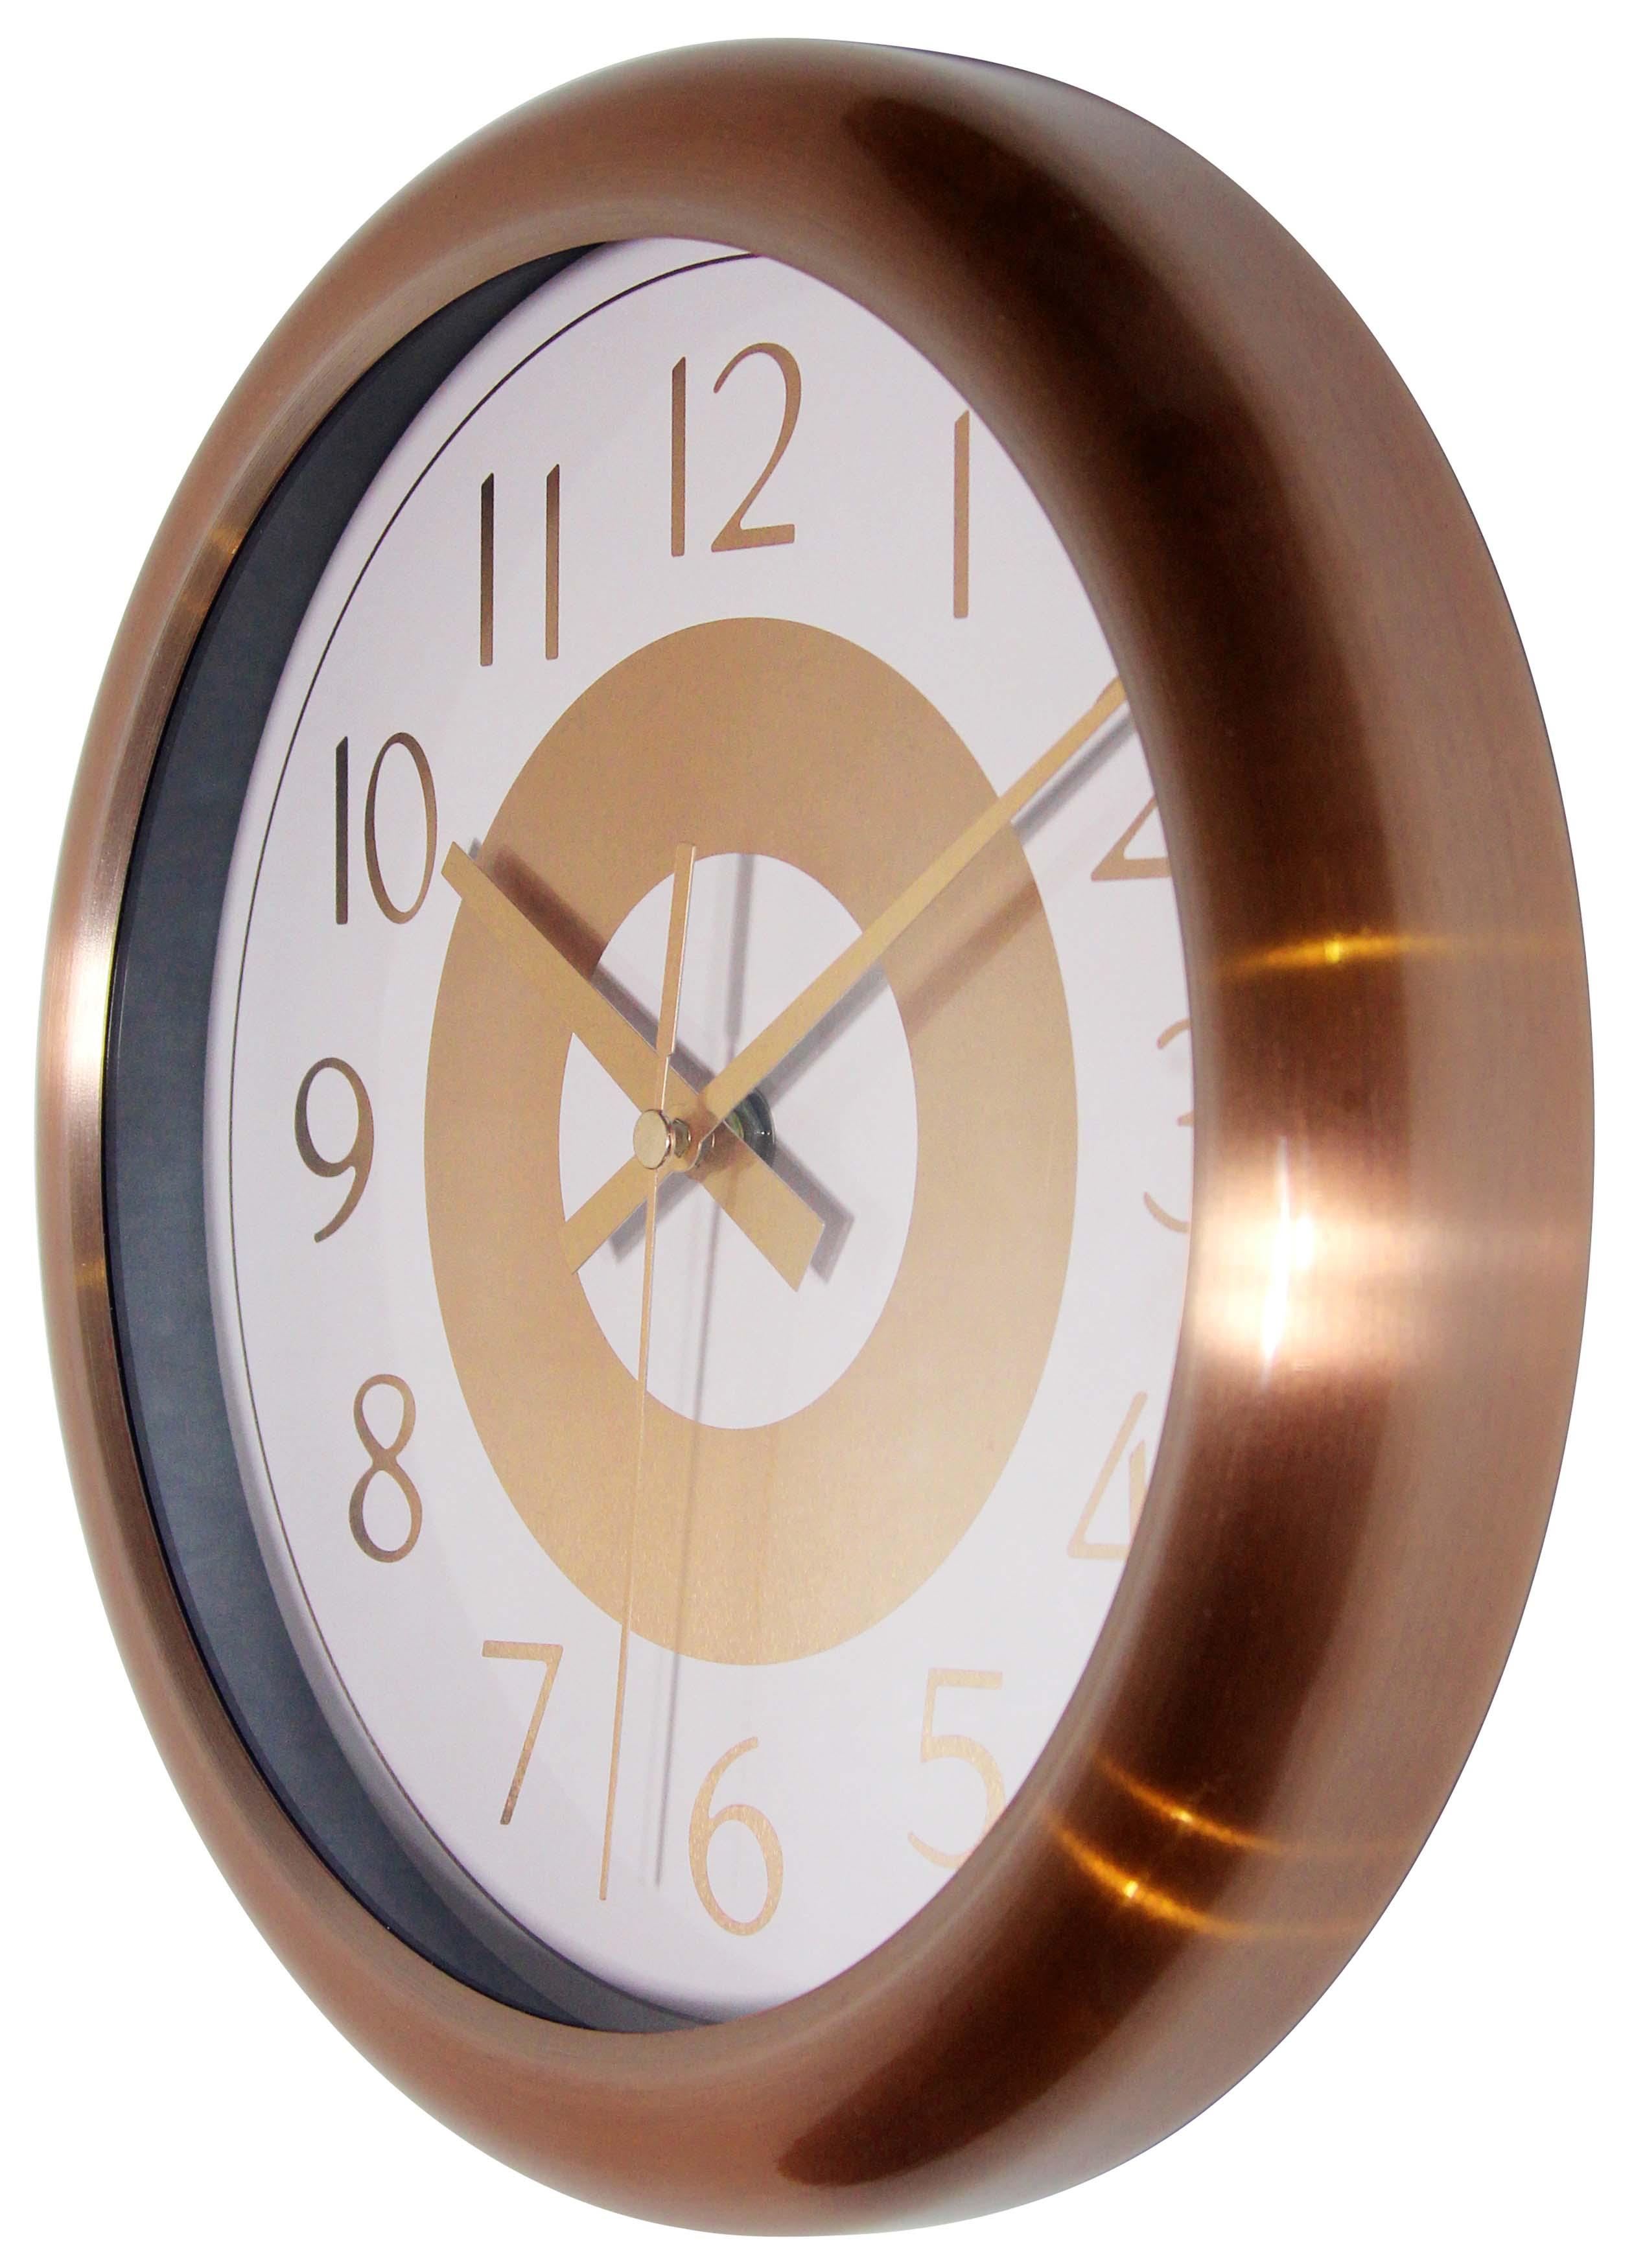 10 inch copper classic copper wall clock clock by room. Black Bedroom Furniture Sets. Home Design Ideas